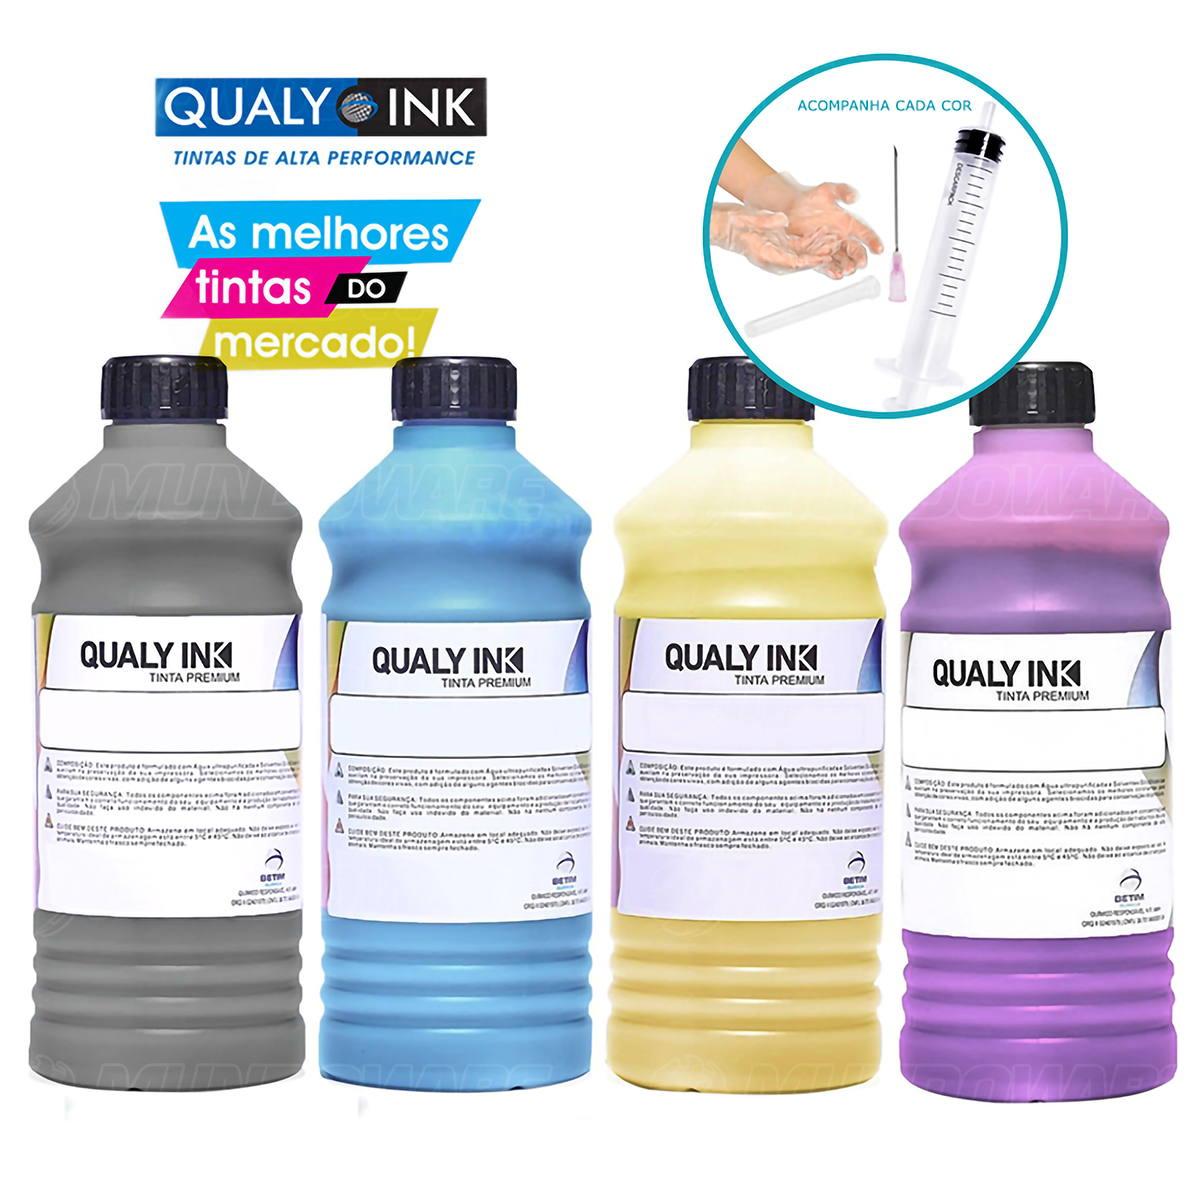 Compatível: Kit 4 Cores Tinta Corante Qualy-Ink para Recarga de Cartuchos HP série 3000 CMYK 4 de 1L